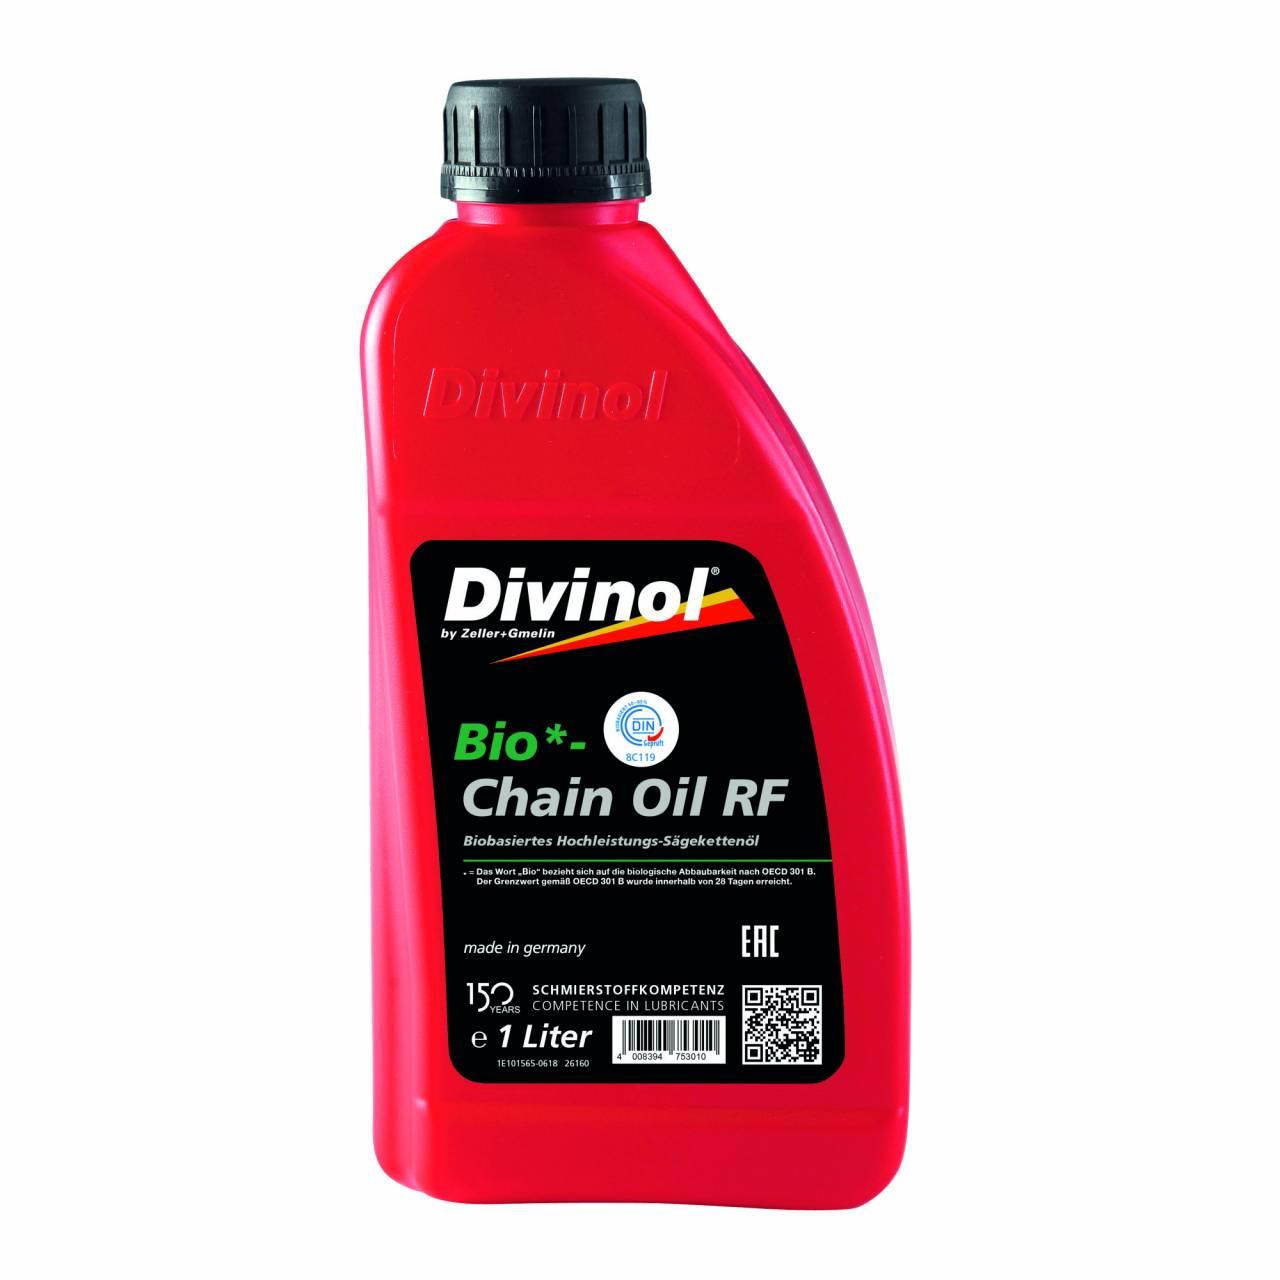 Bio-Chain Oil RF 'Divinol' / 1,0 l Kanister